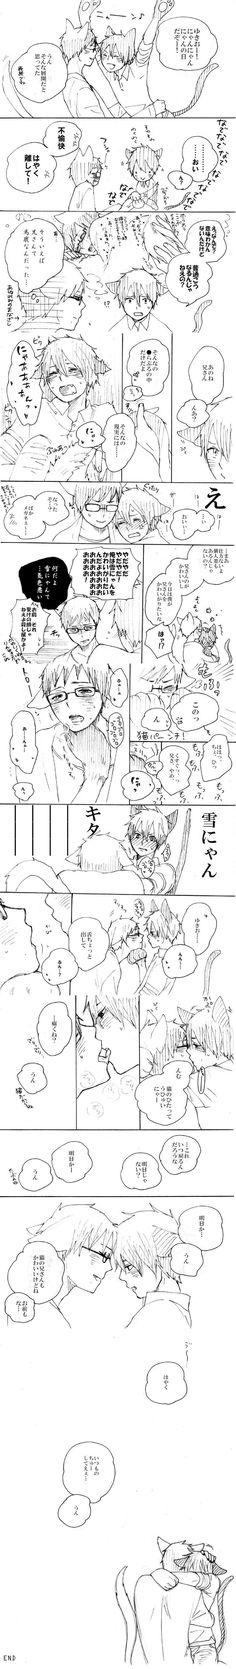 /Ao no Exorcist/#1003909 - Zerochan